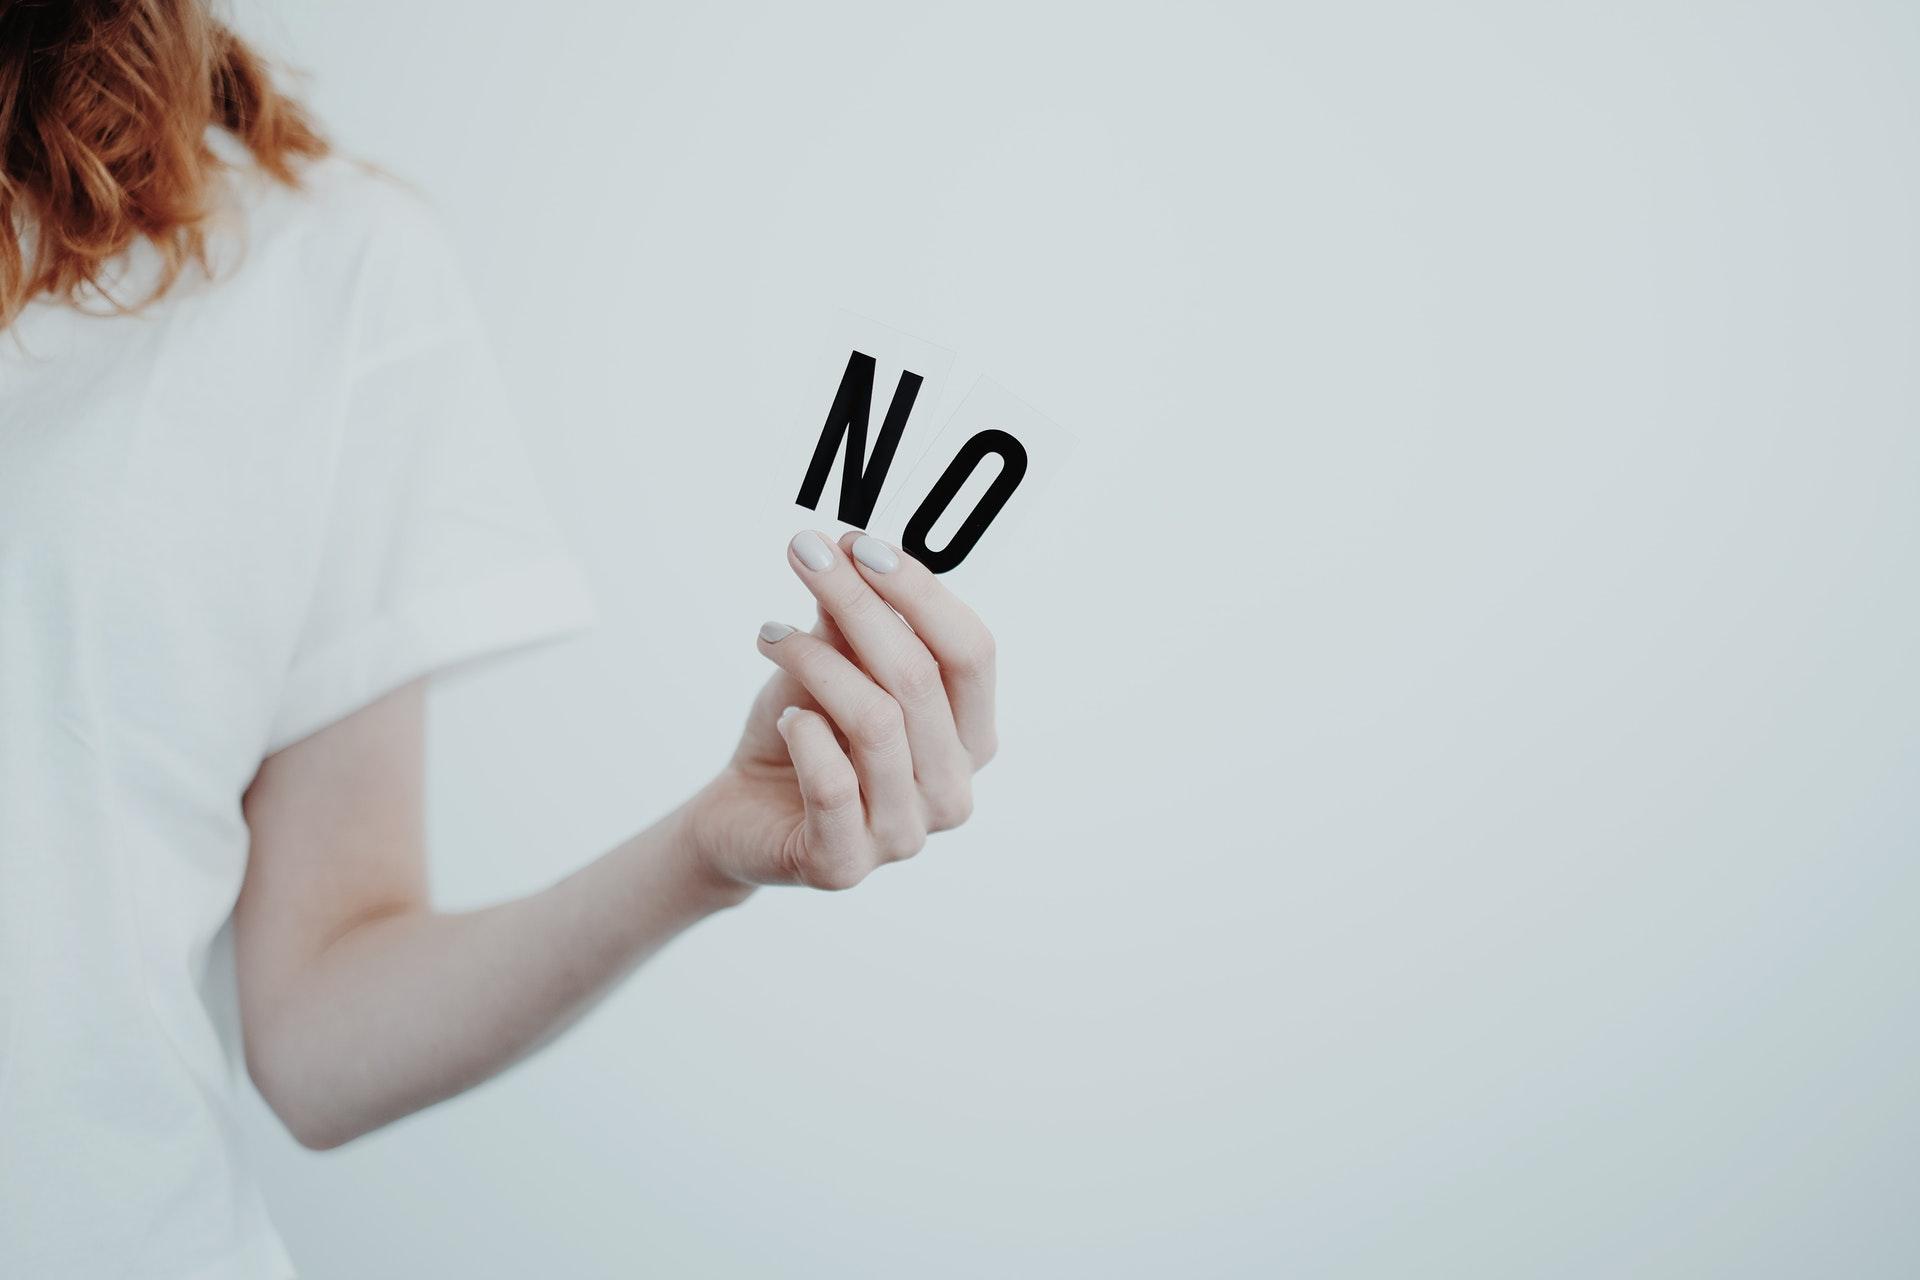 NOを持った女性